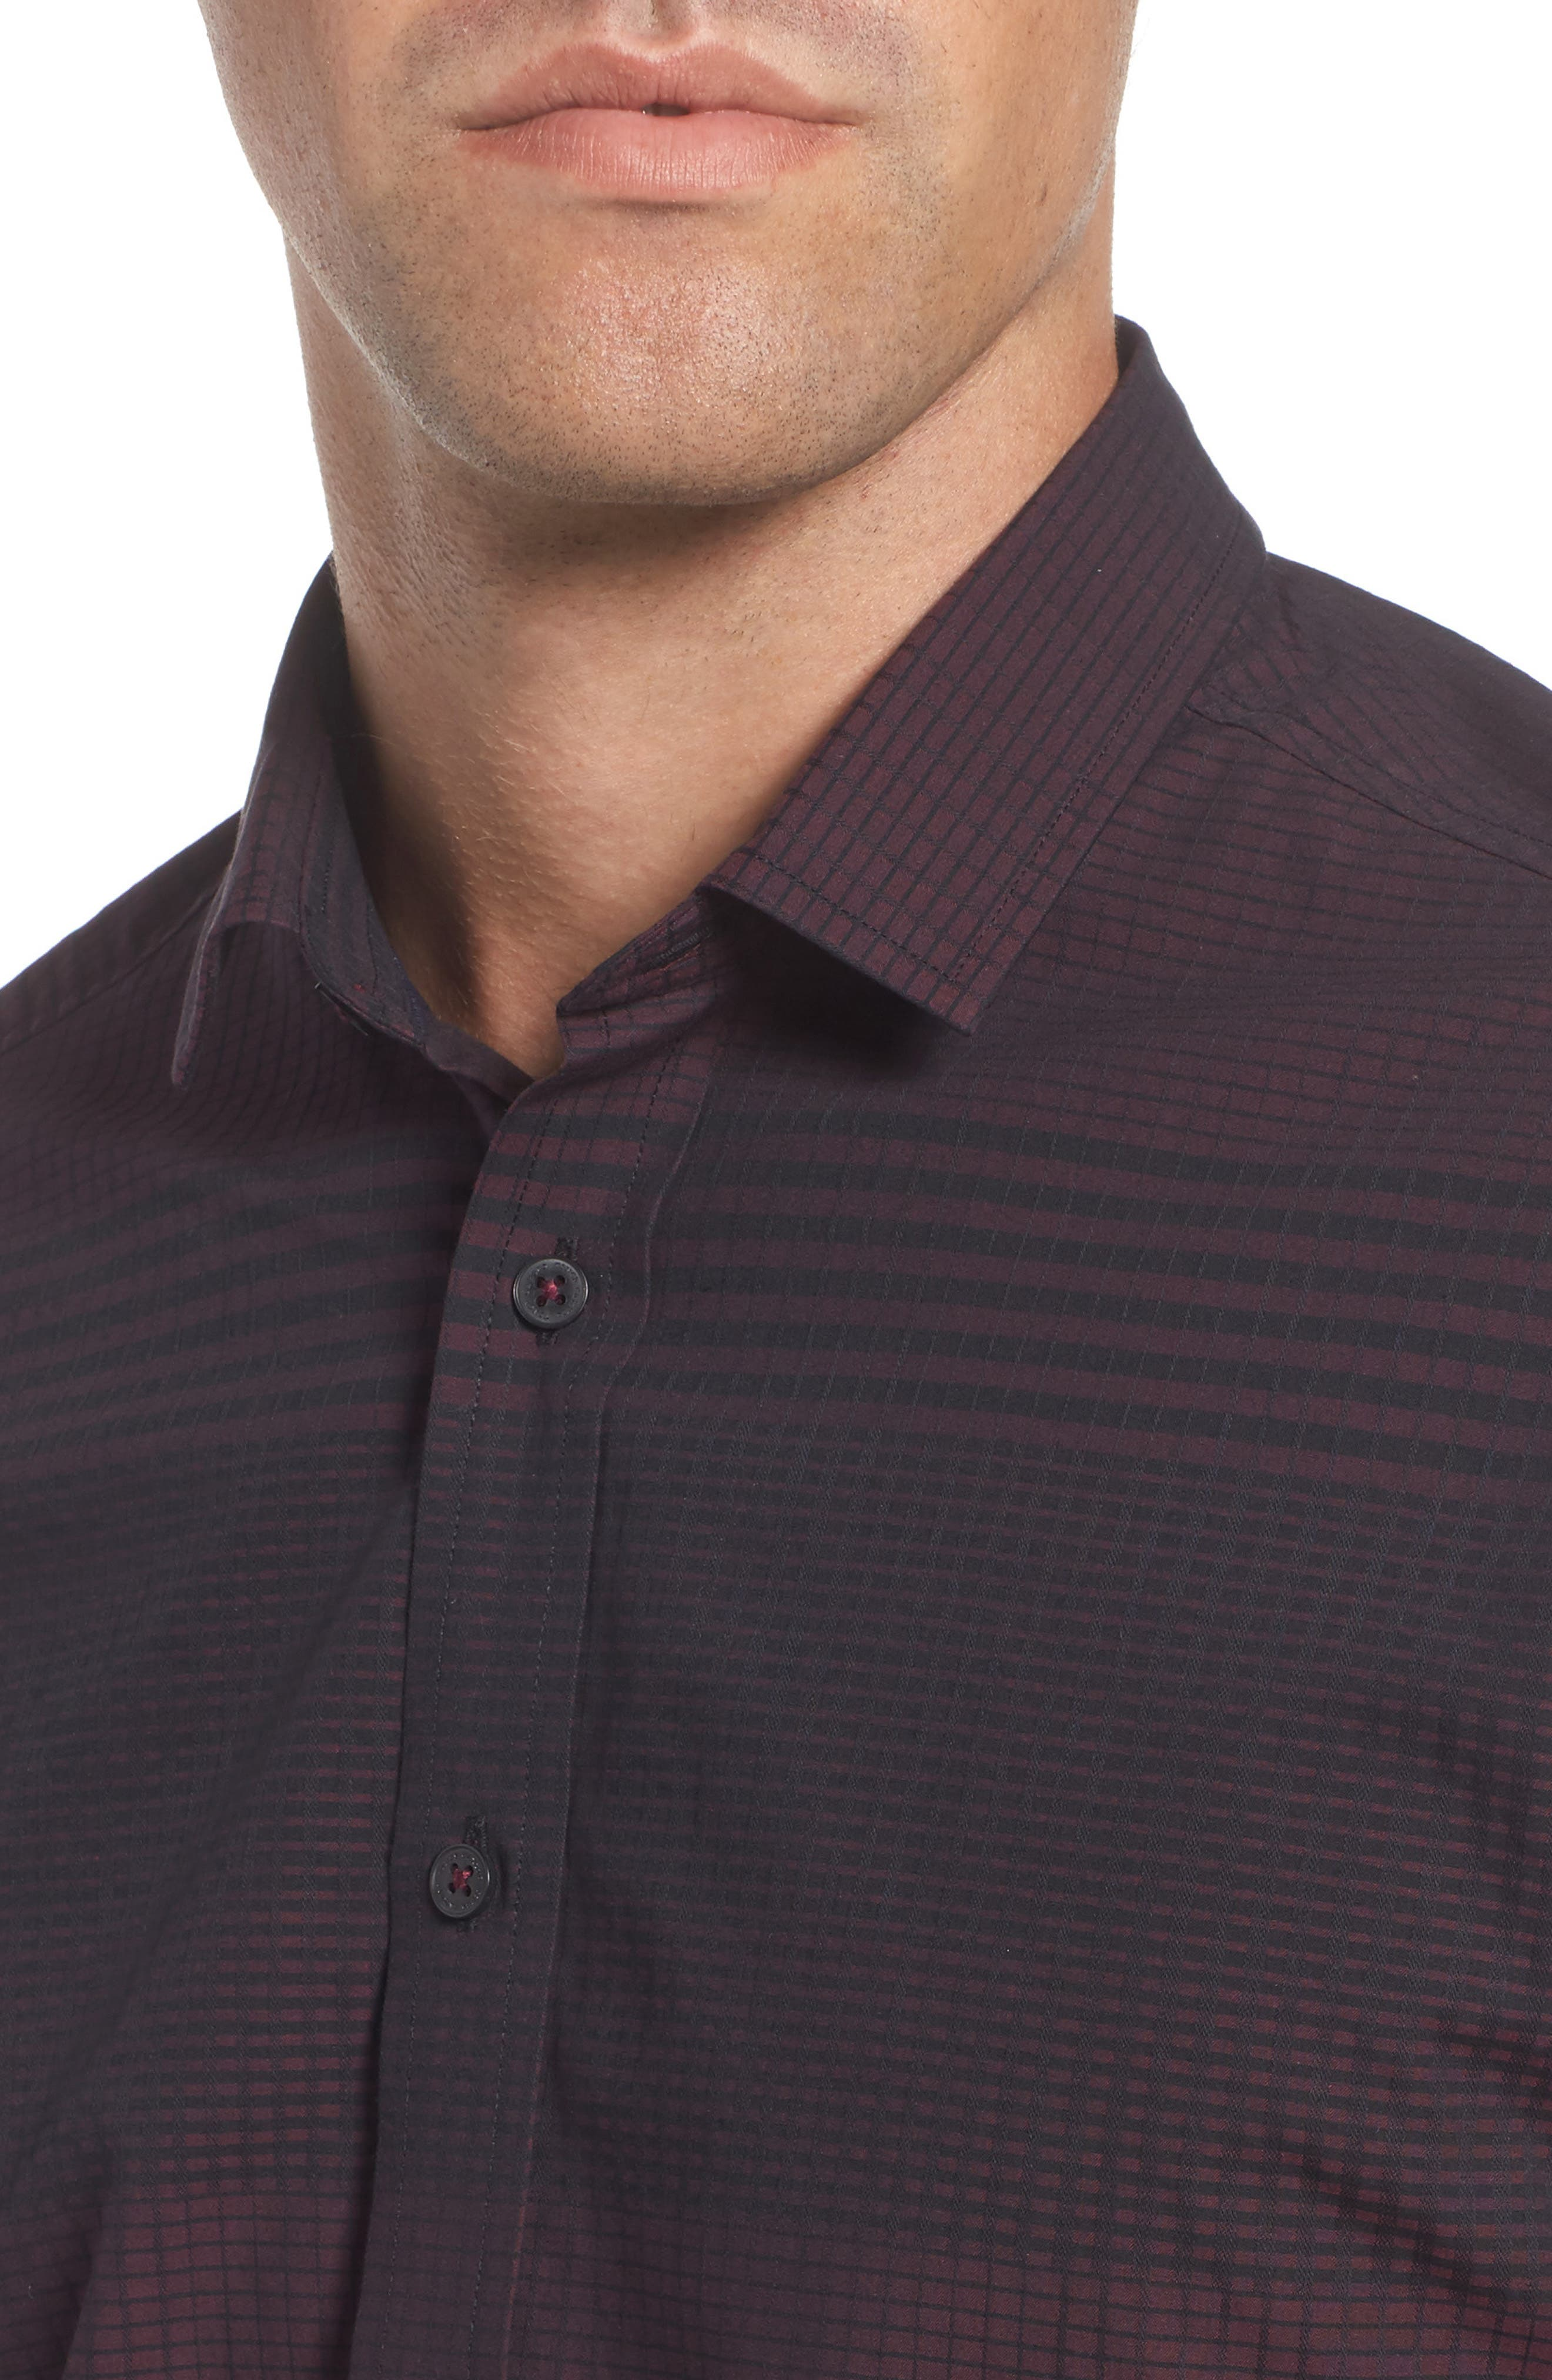 Slim Fit Check Plaid Sport Shirt,                             Alternate thumbnail 4, color,                             BURGUNDY/ BLACK CHECK PLAID